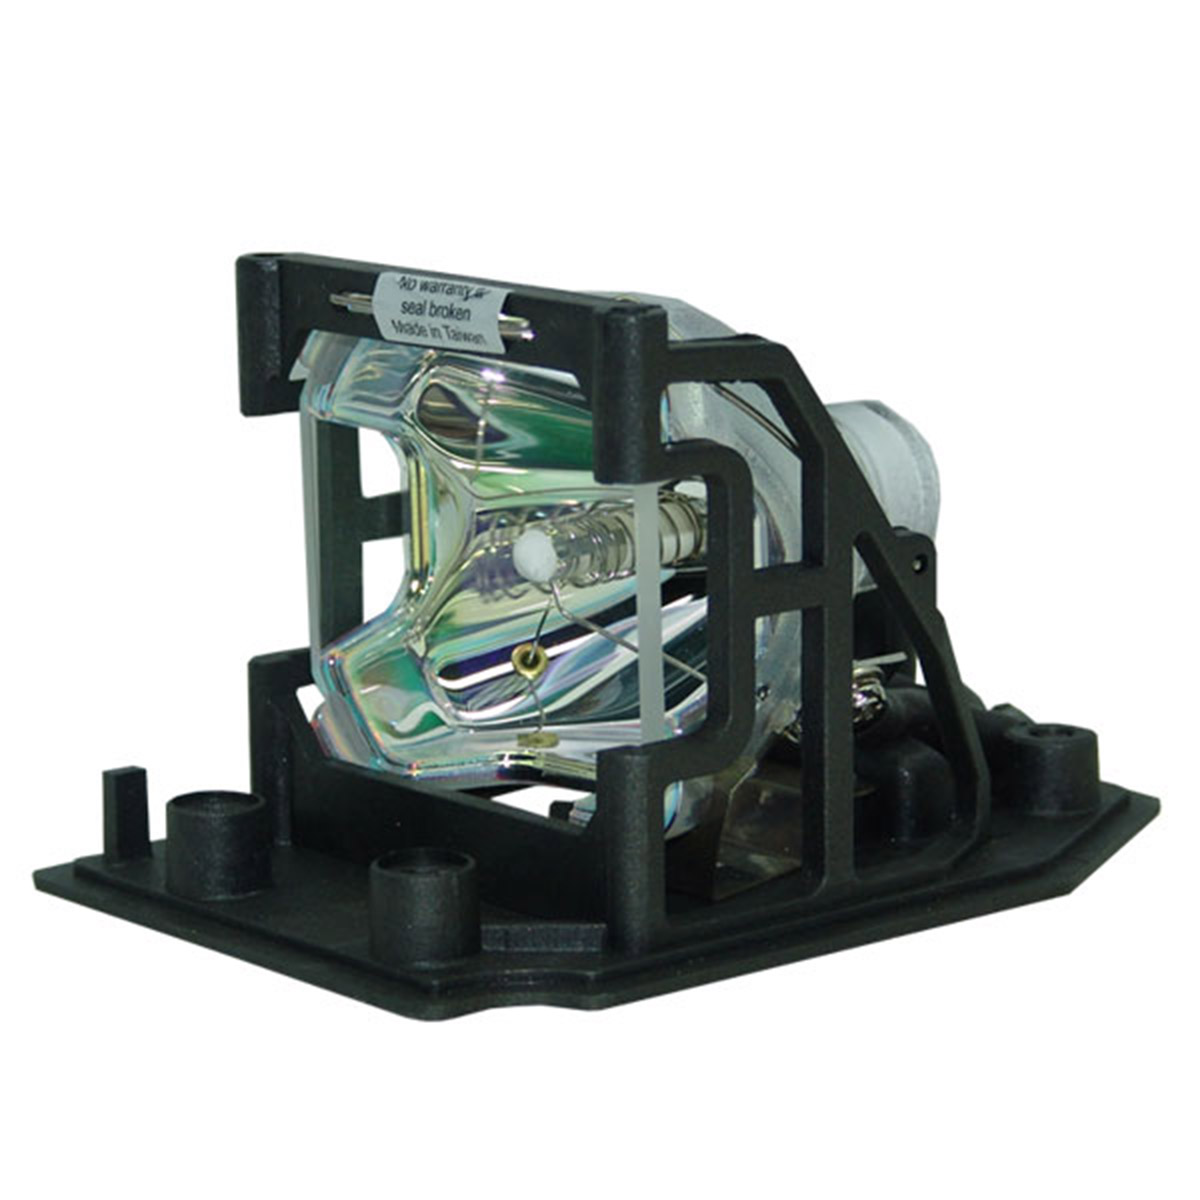 Lamp Housing For Infocus SP LAMP LF2E Projector DLP LCD Bulb